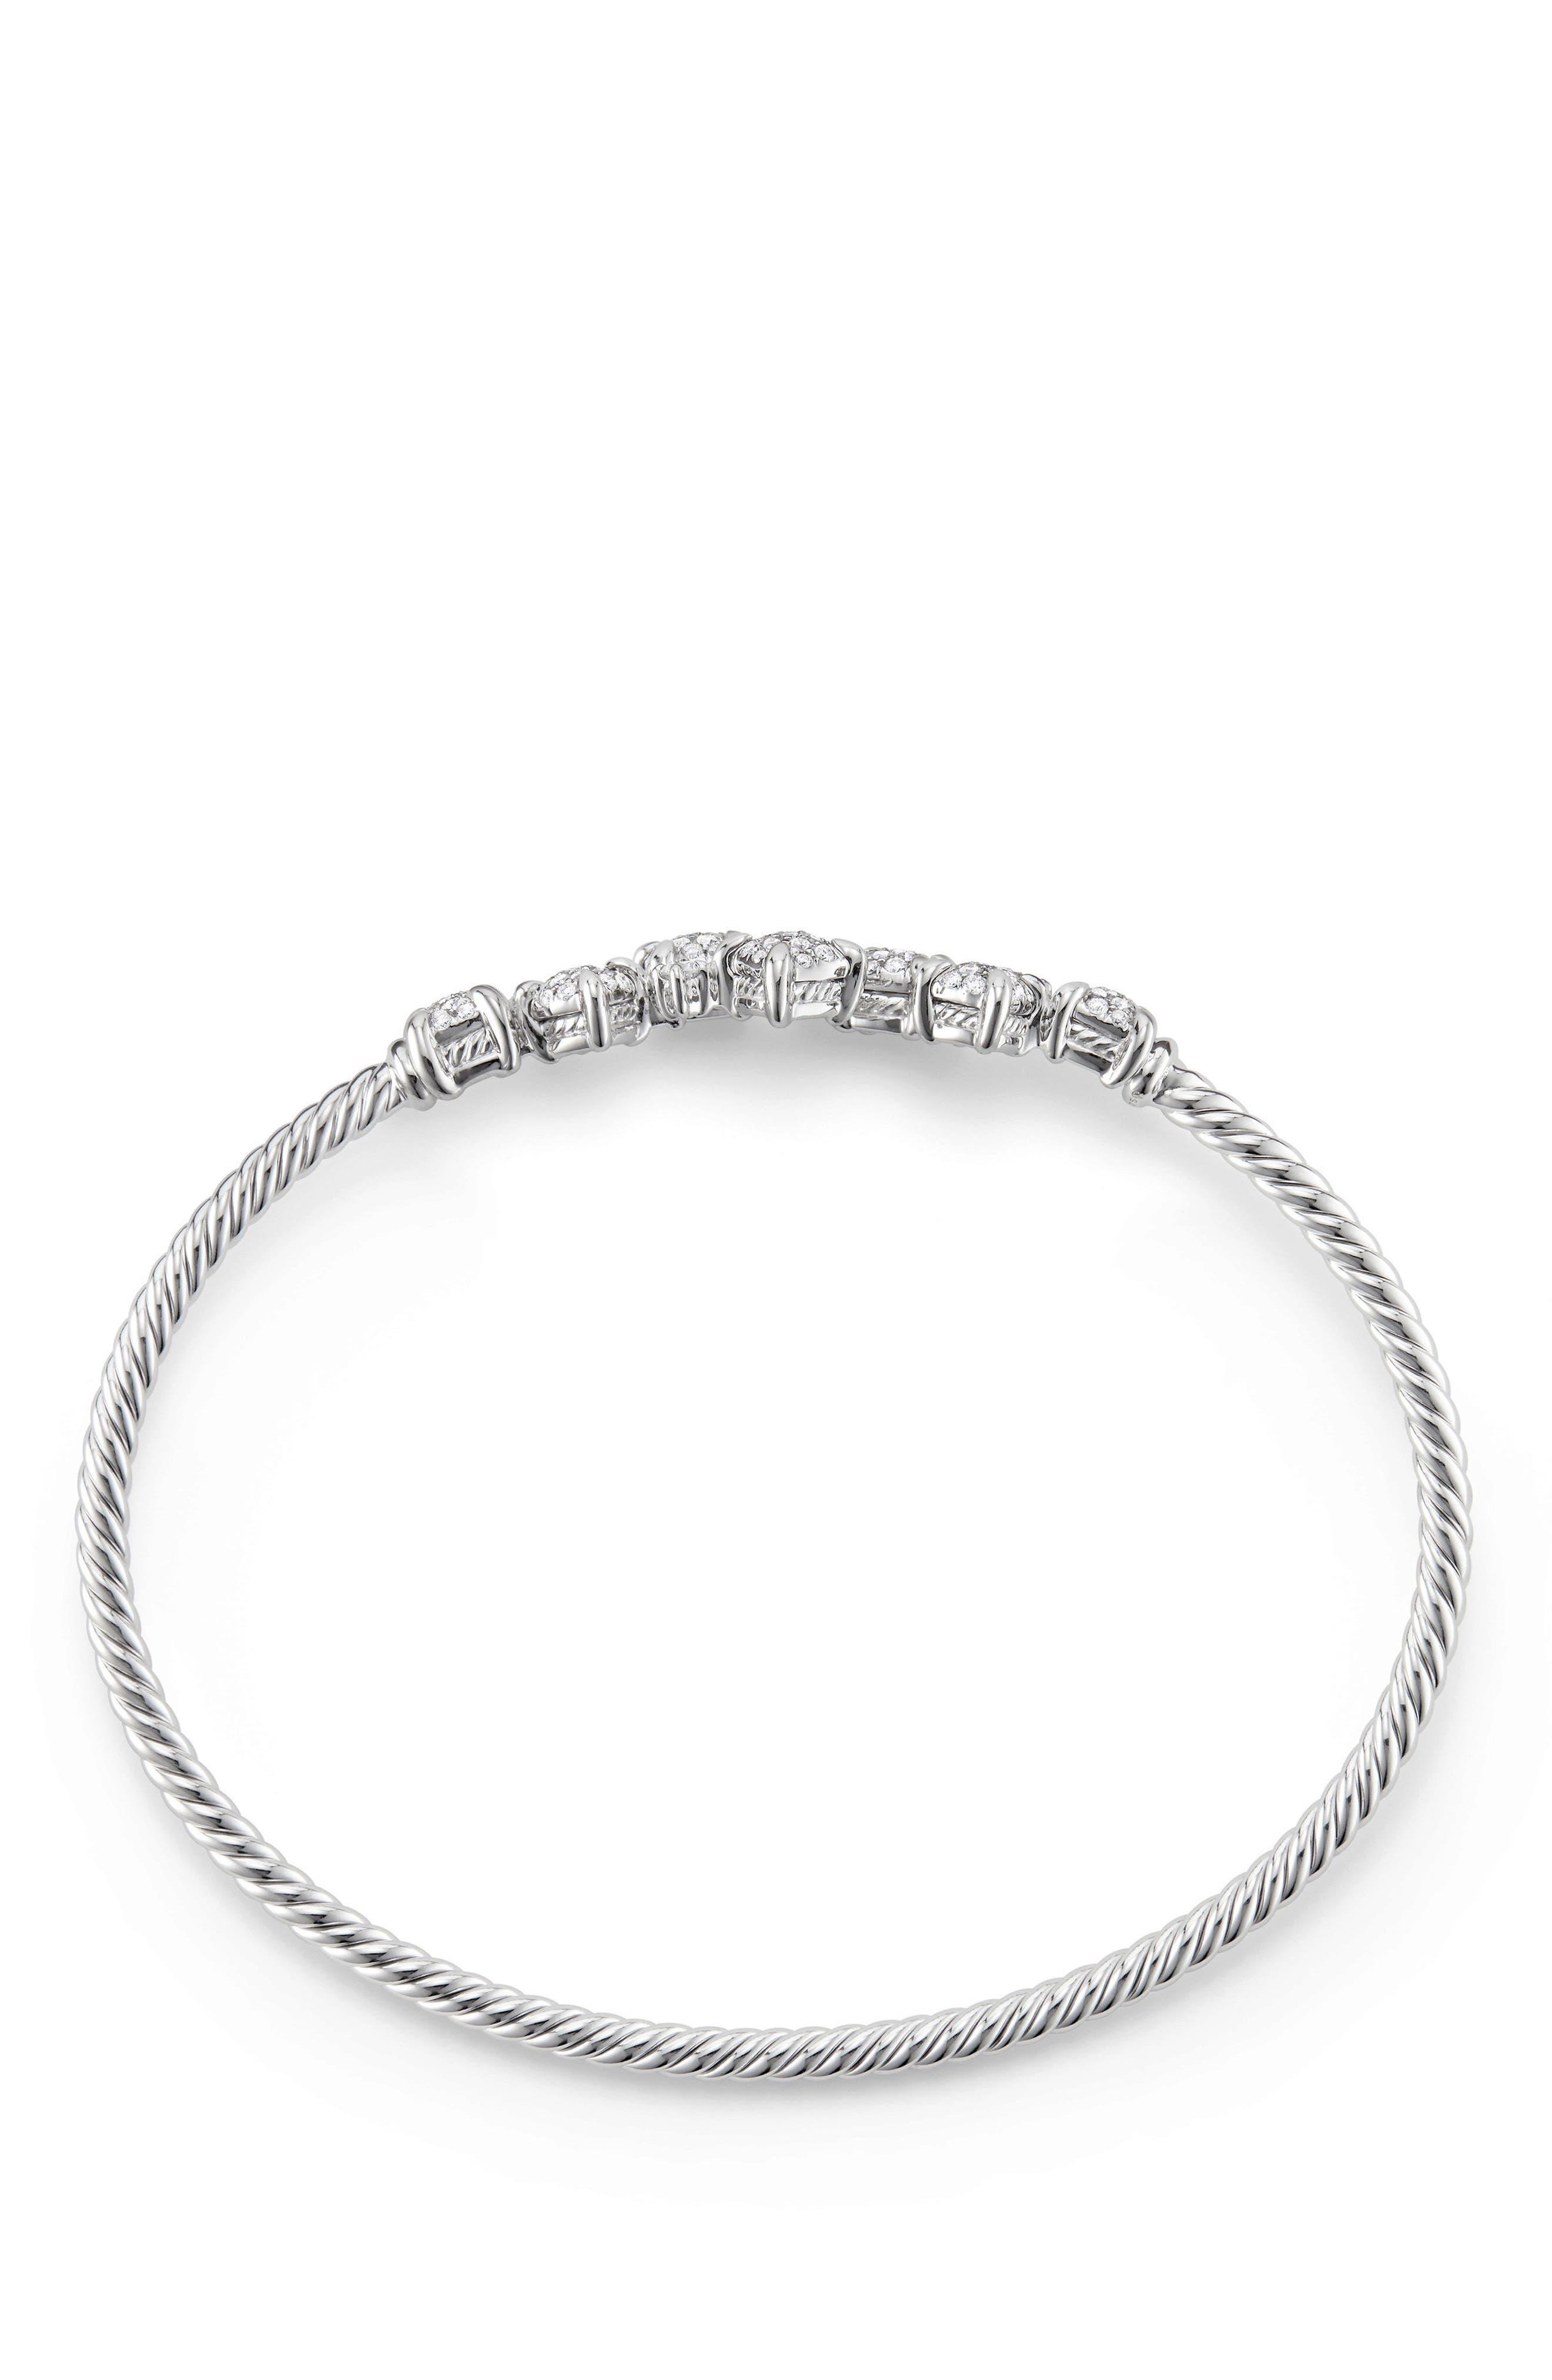 Precious Châtelaine Bracelet with Diamonds in 18K Gold,                             Alternate thumbnail 2, color,                             WHITE GOLD/ DIAMOND